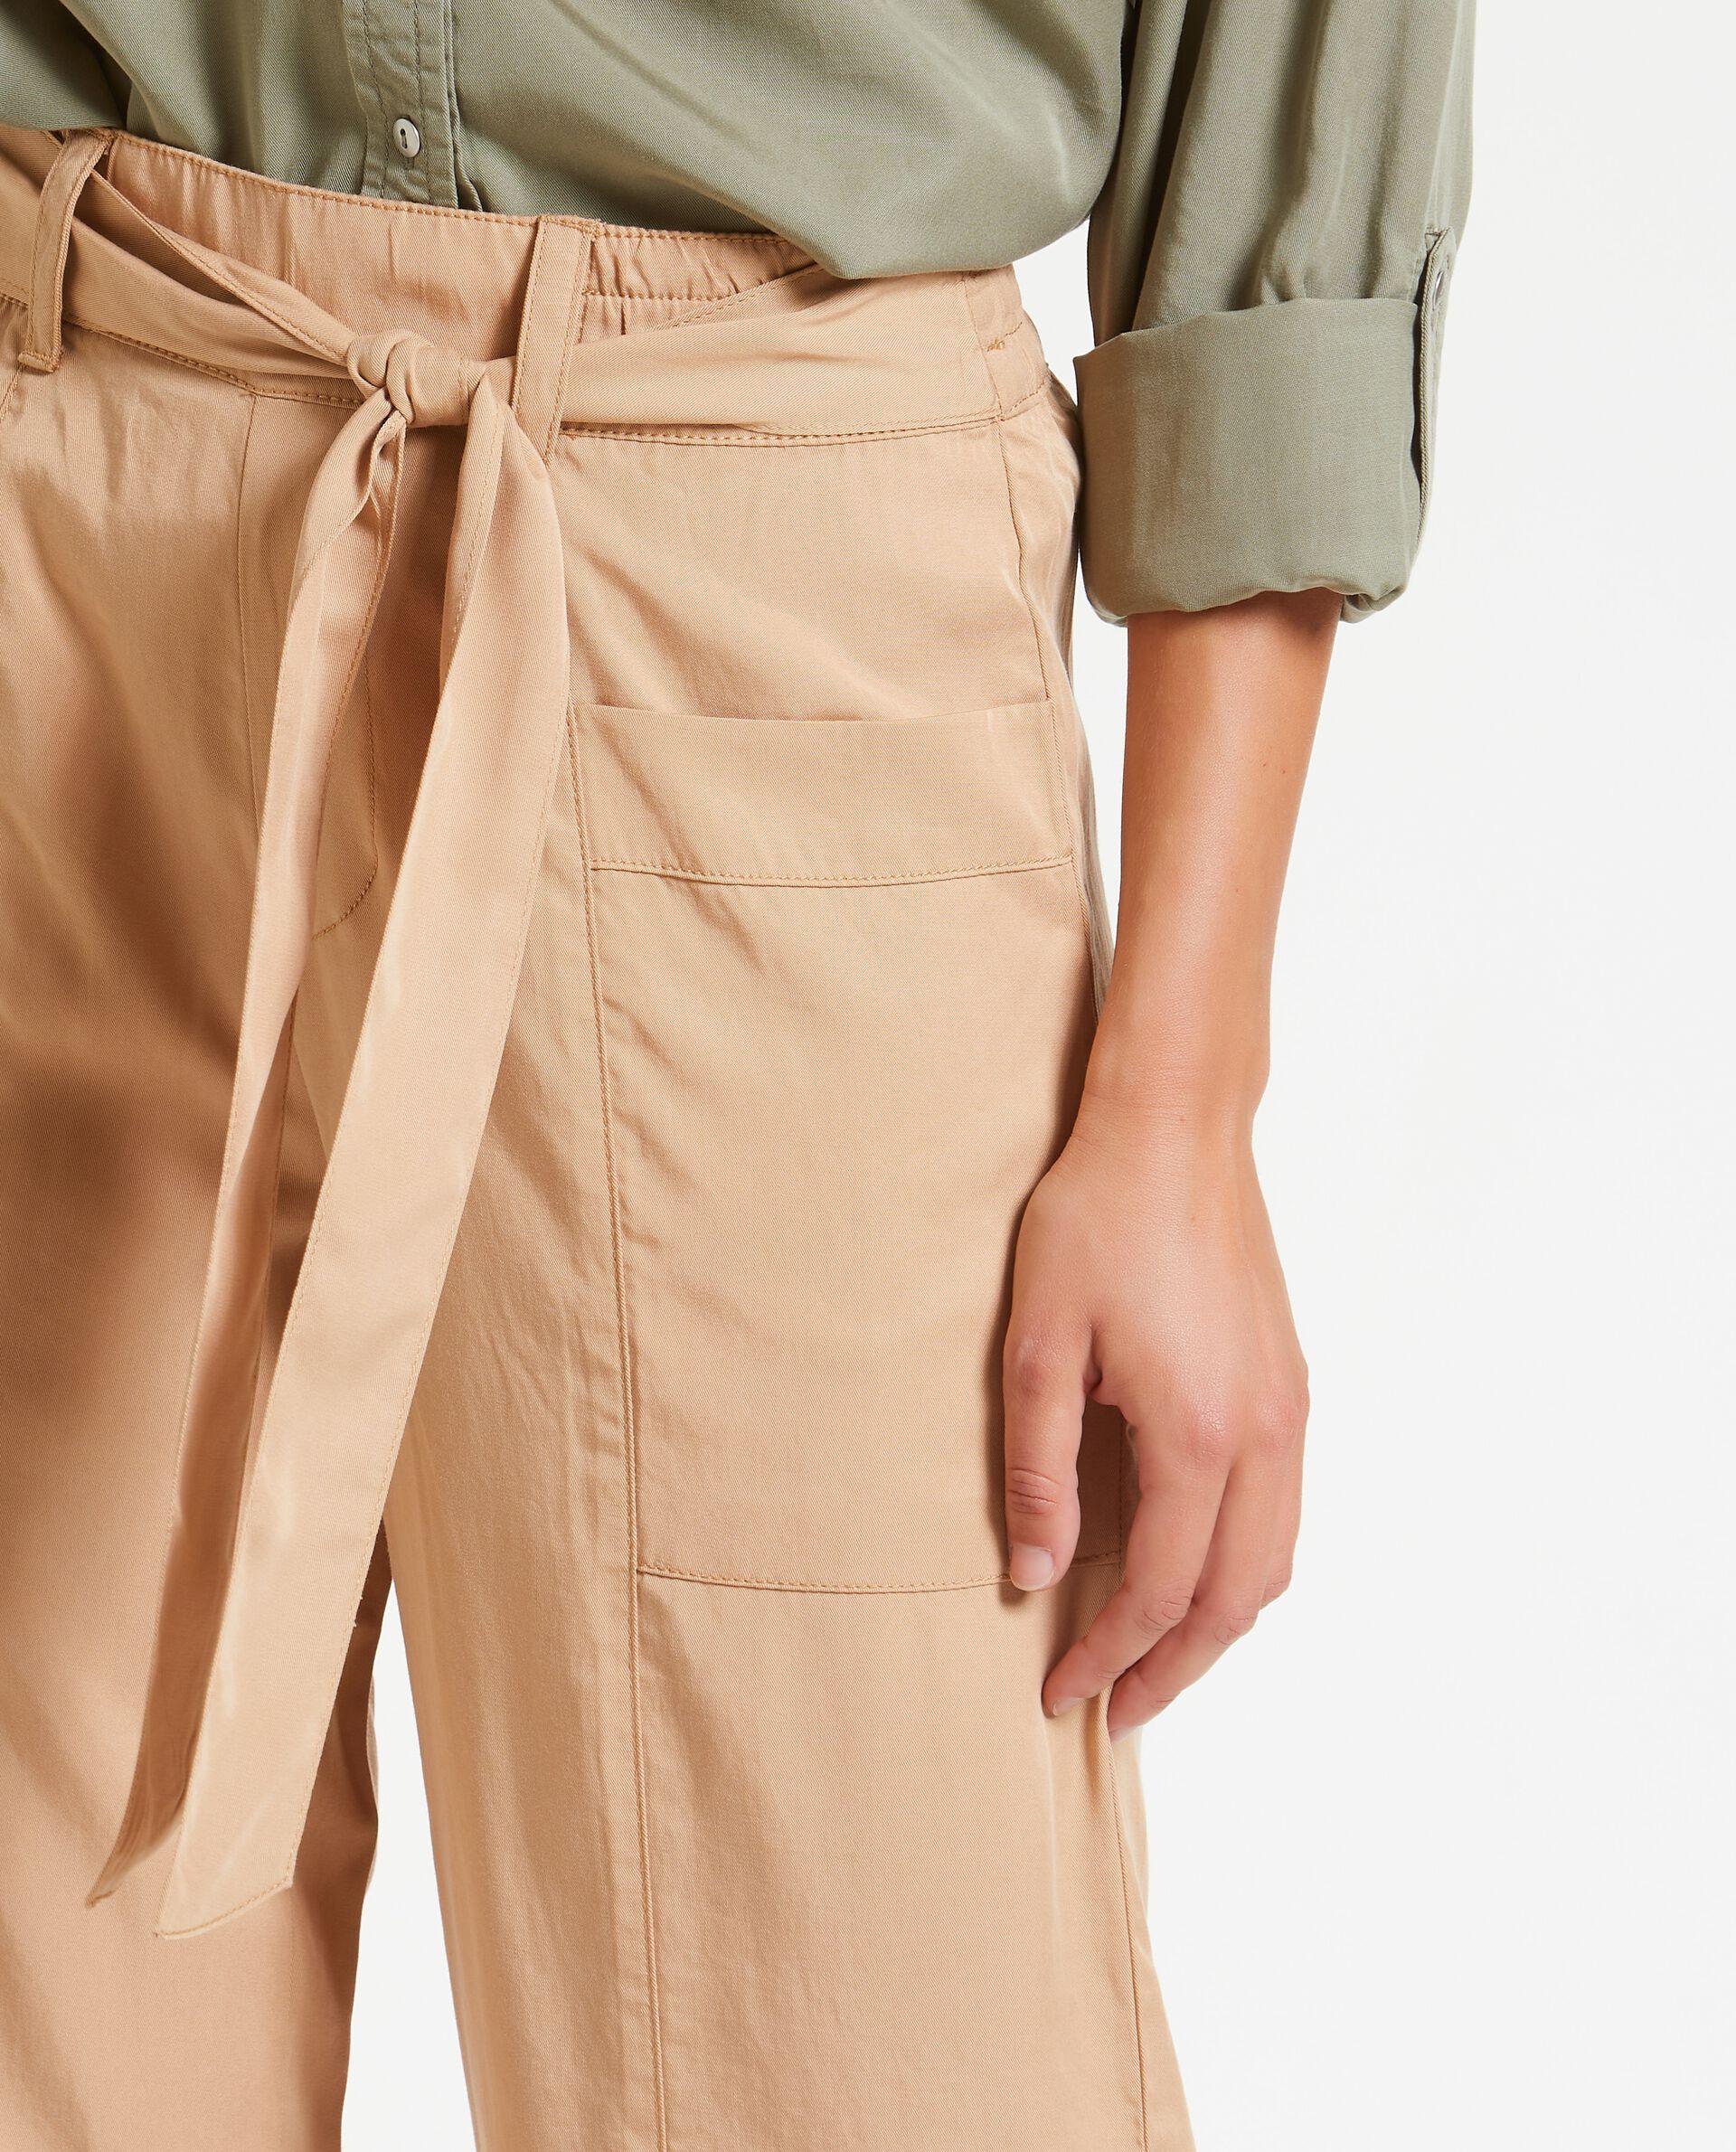 Pantaloni donna freschi in puro Lyocell naturale